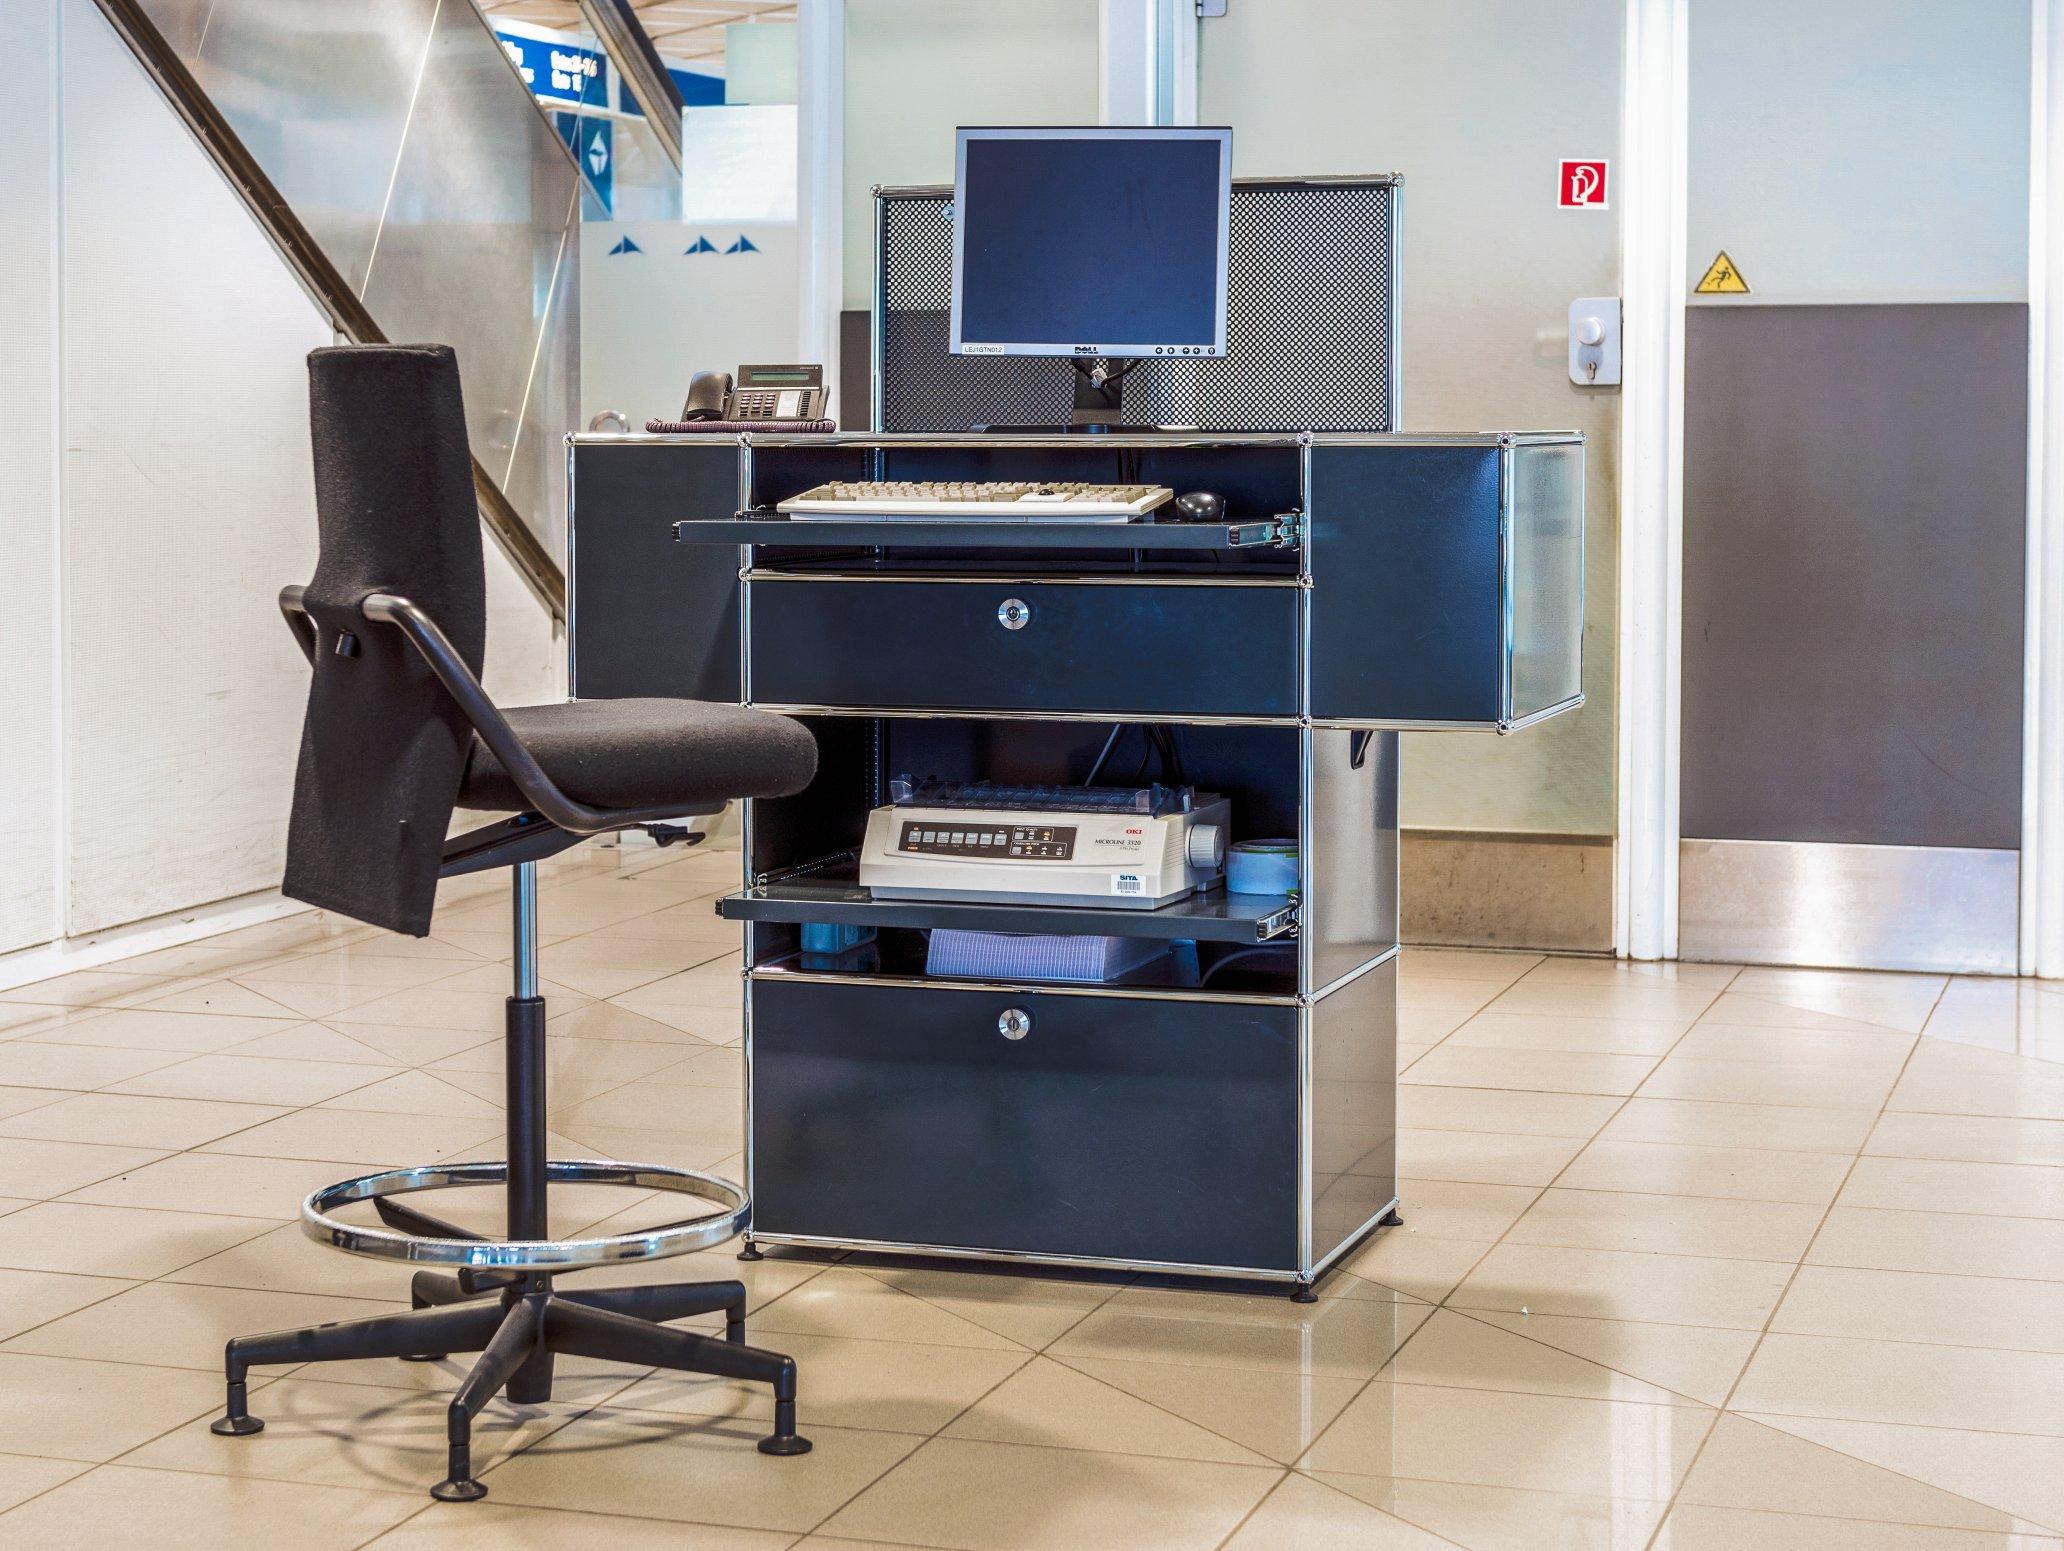 USM Airport Halle-Leipzig Counter